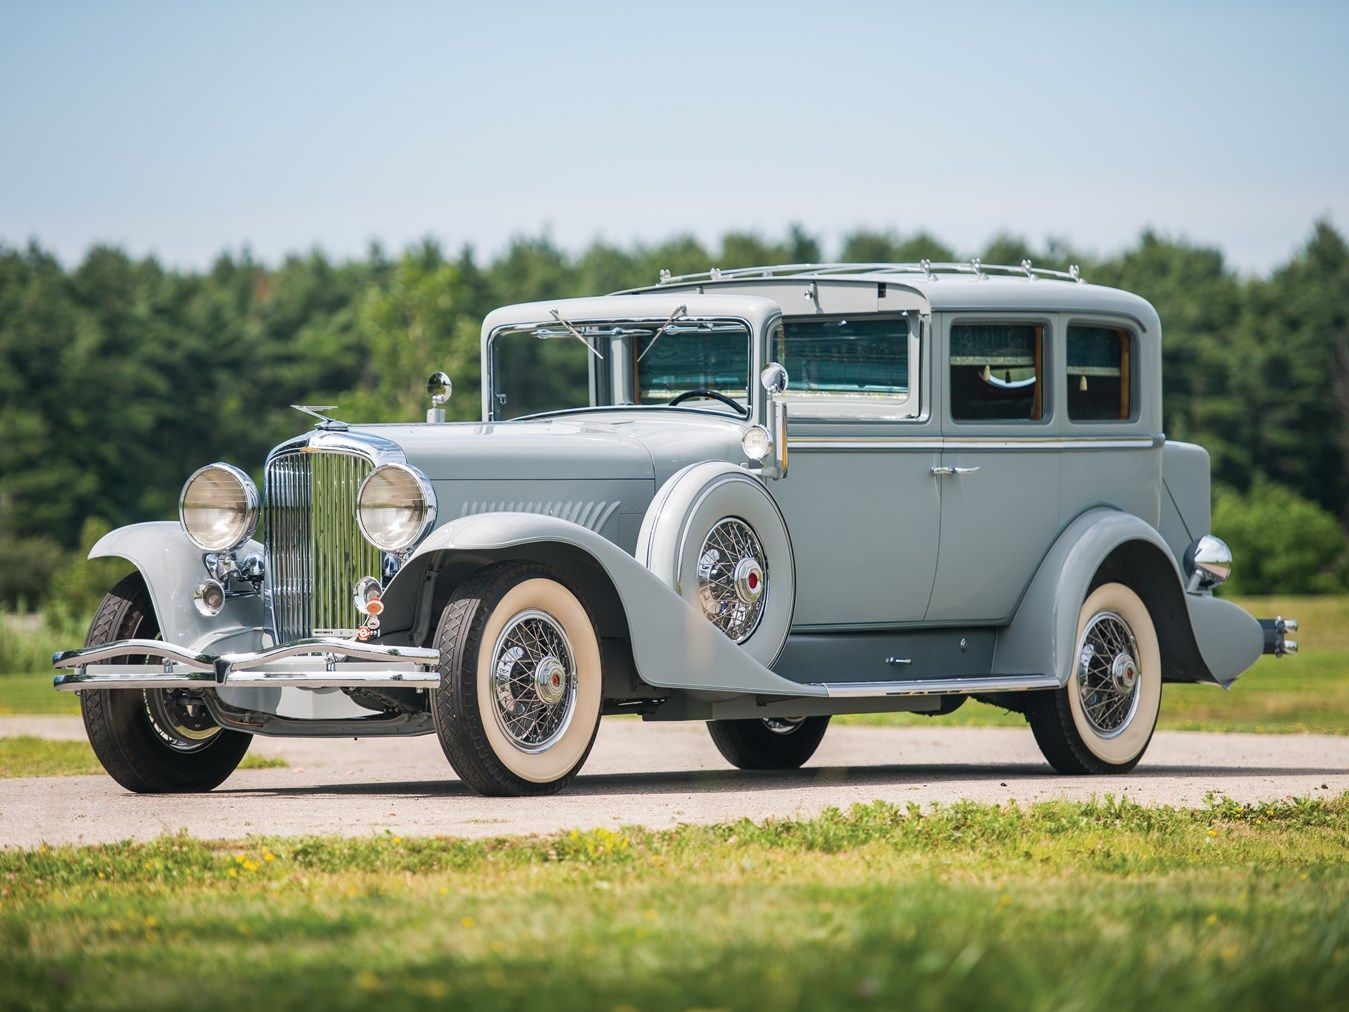 1932 Duesenberg Model J Town Car By Kirchhoff Chassis No 2514